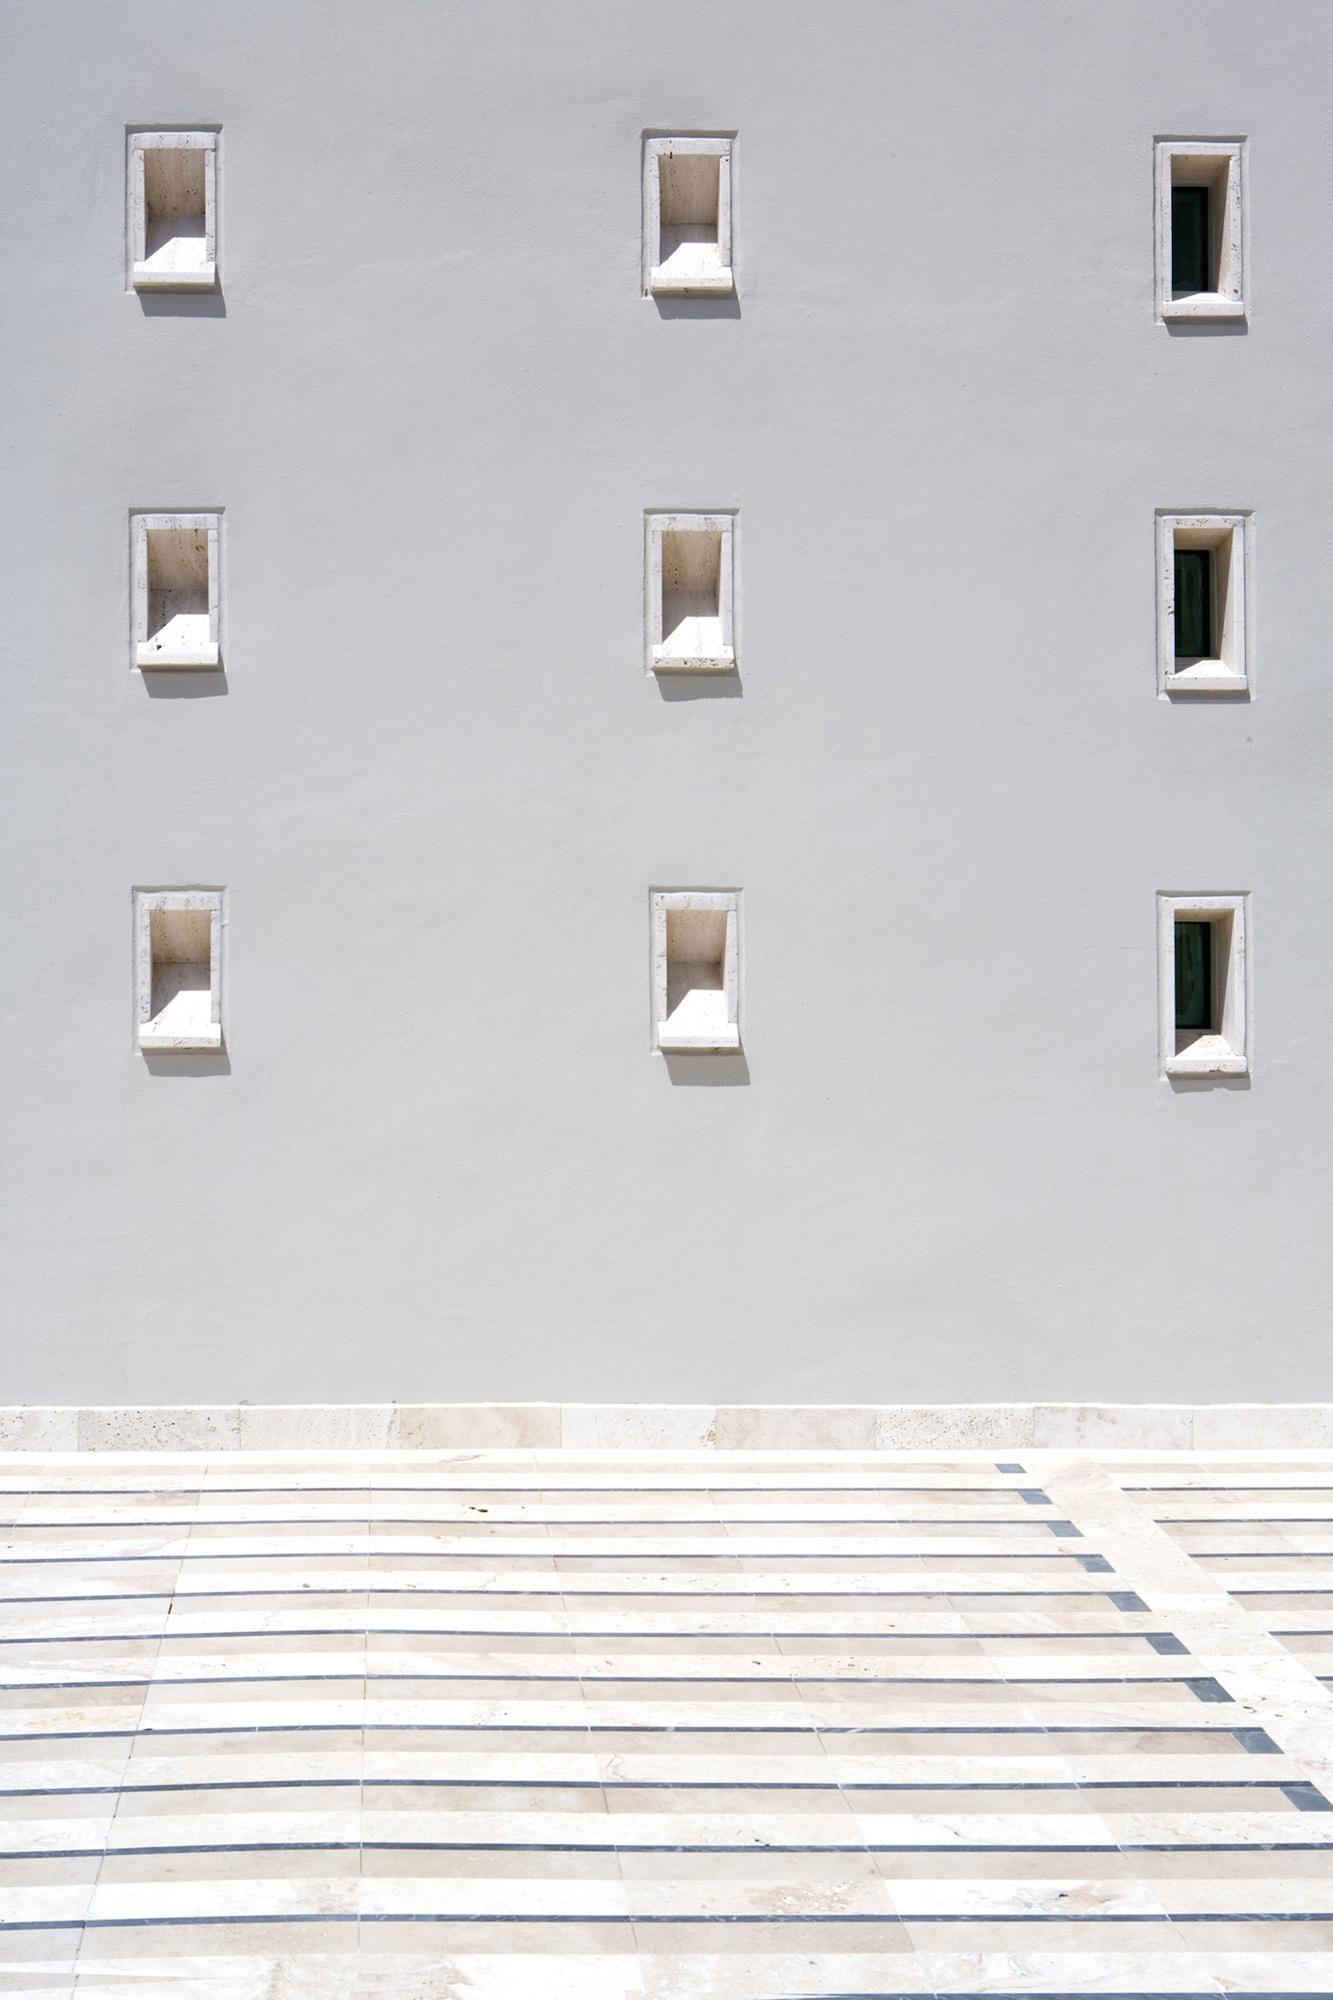 residencia-tavernier-drive-luis-pons-design-lab_chayane_house_032607_038